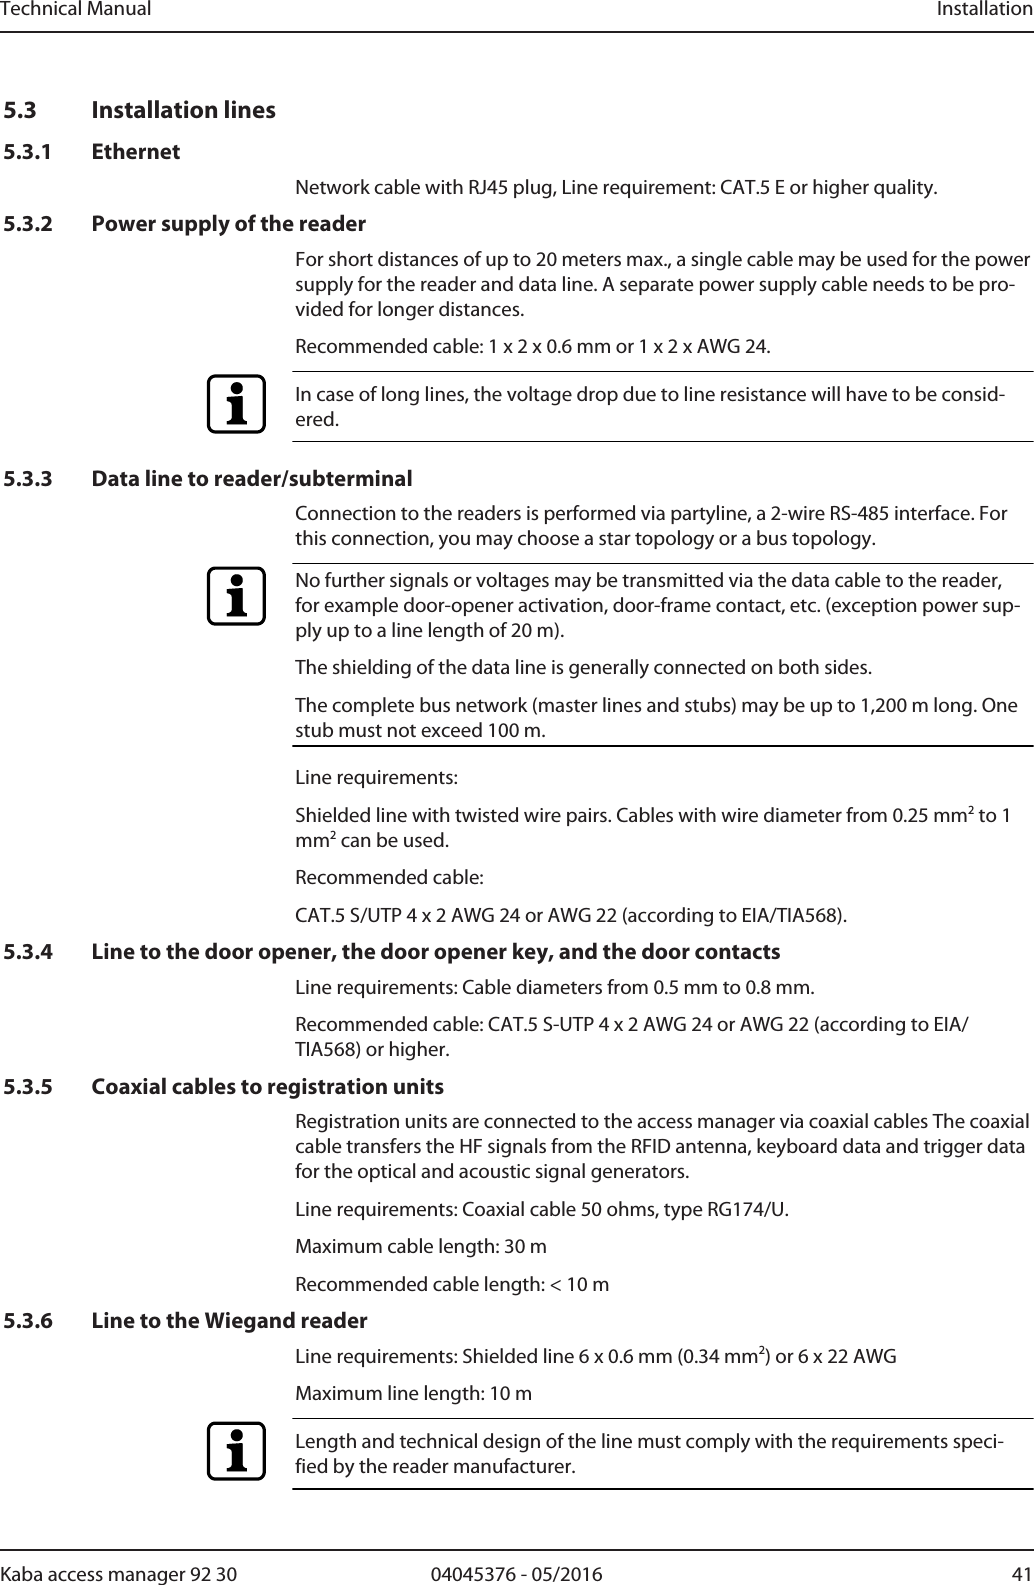 Tiger Wire 0 5 Ohm 20 Pcs Manual Guide